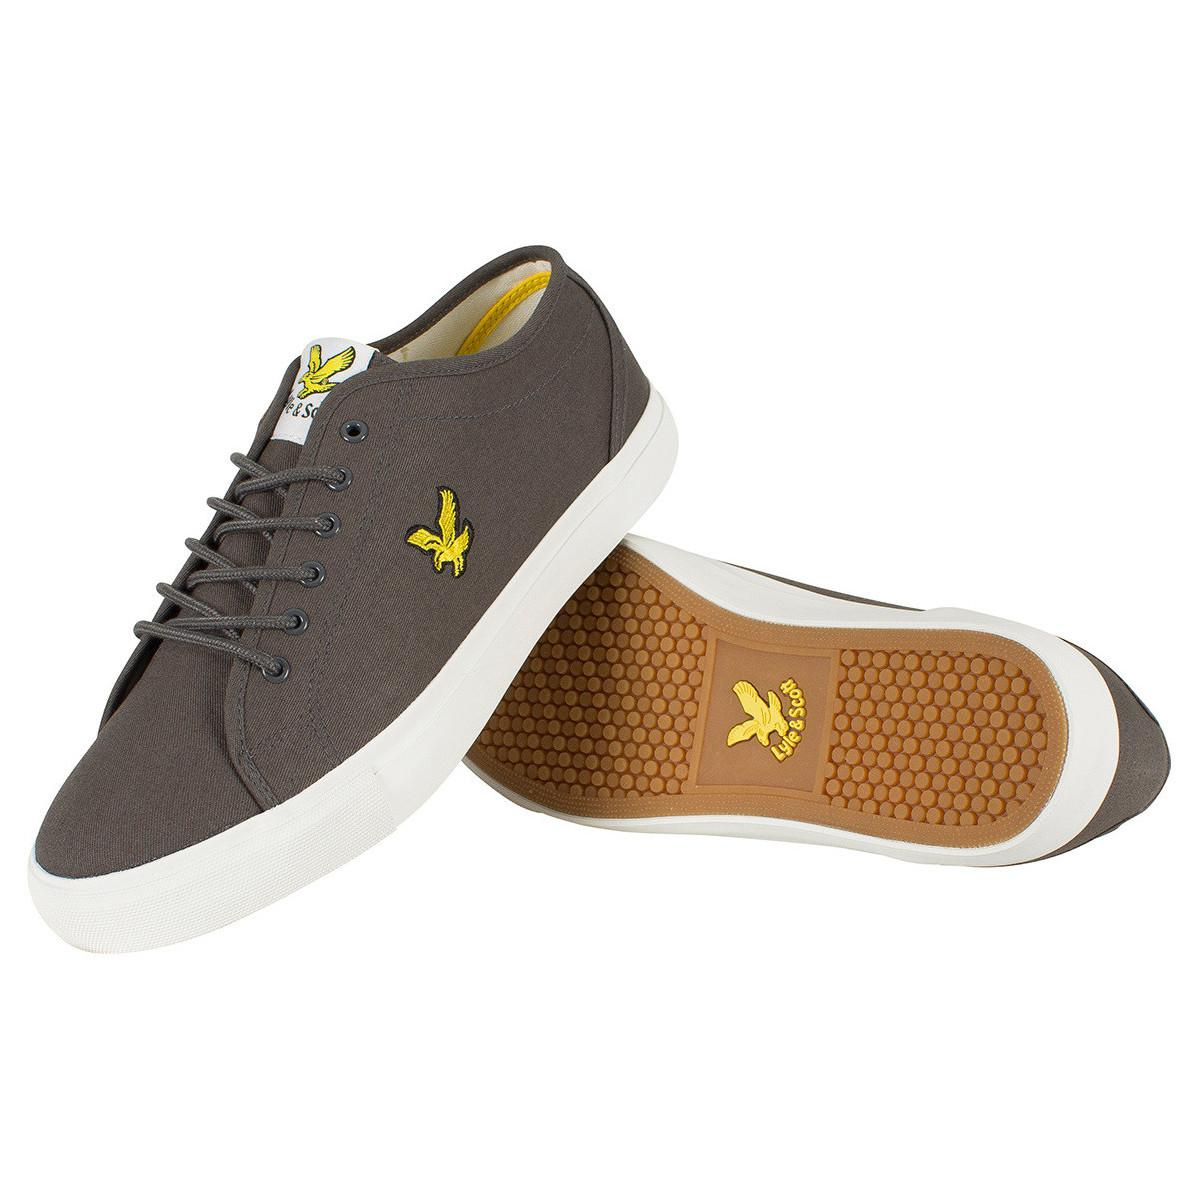 Lyle & Scott Men's Teviot Twill Trainers, Grey Men's Shoes (trainers) In Grey in Grey for Men